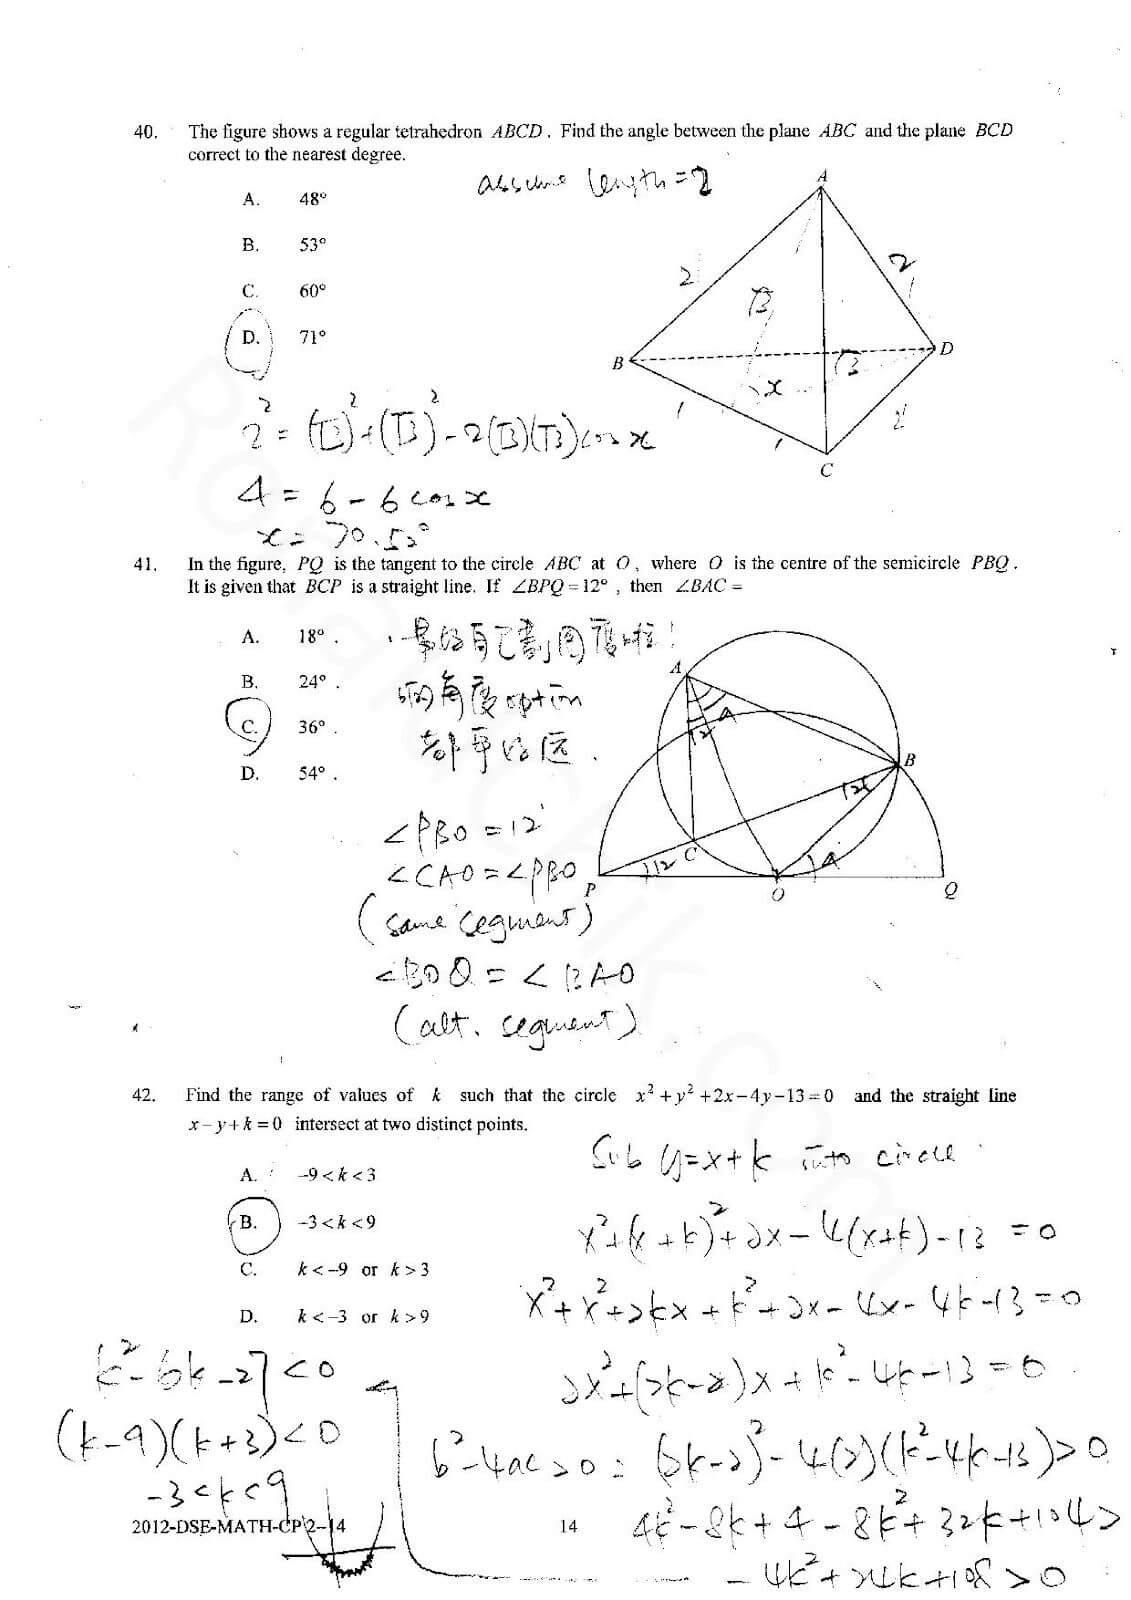 2012 DSE Math P2 卷二 Q40,41,42